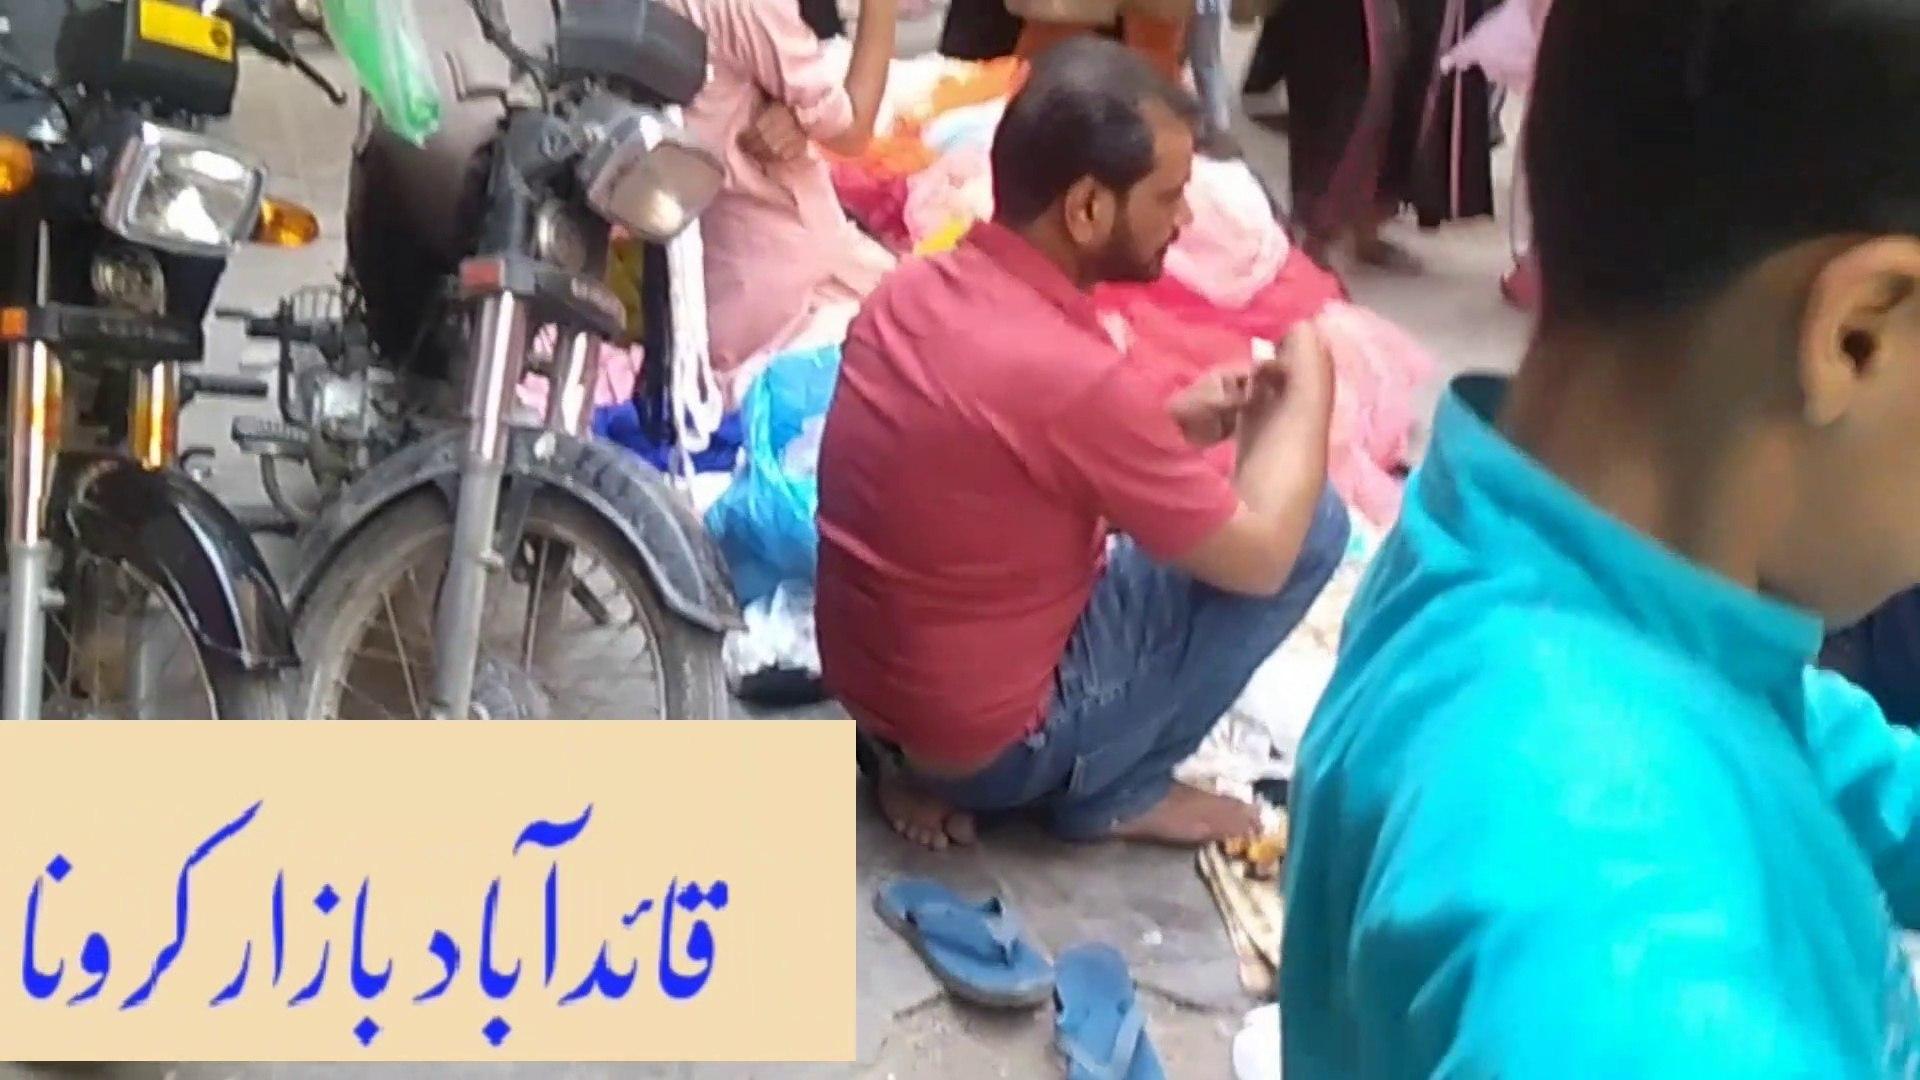 People don't care about Corona virus pakistan